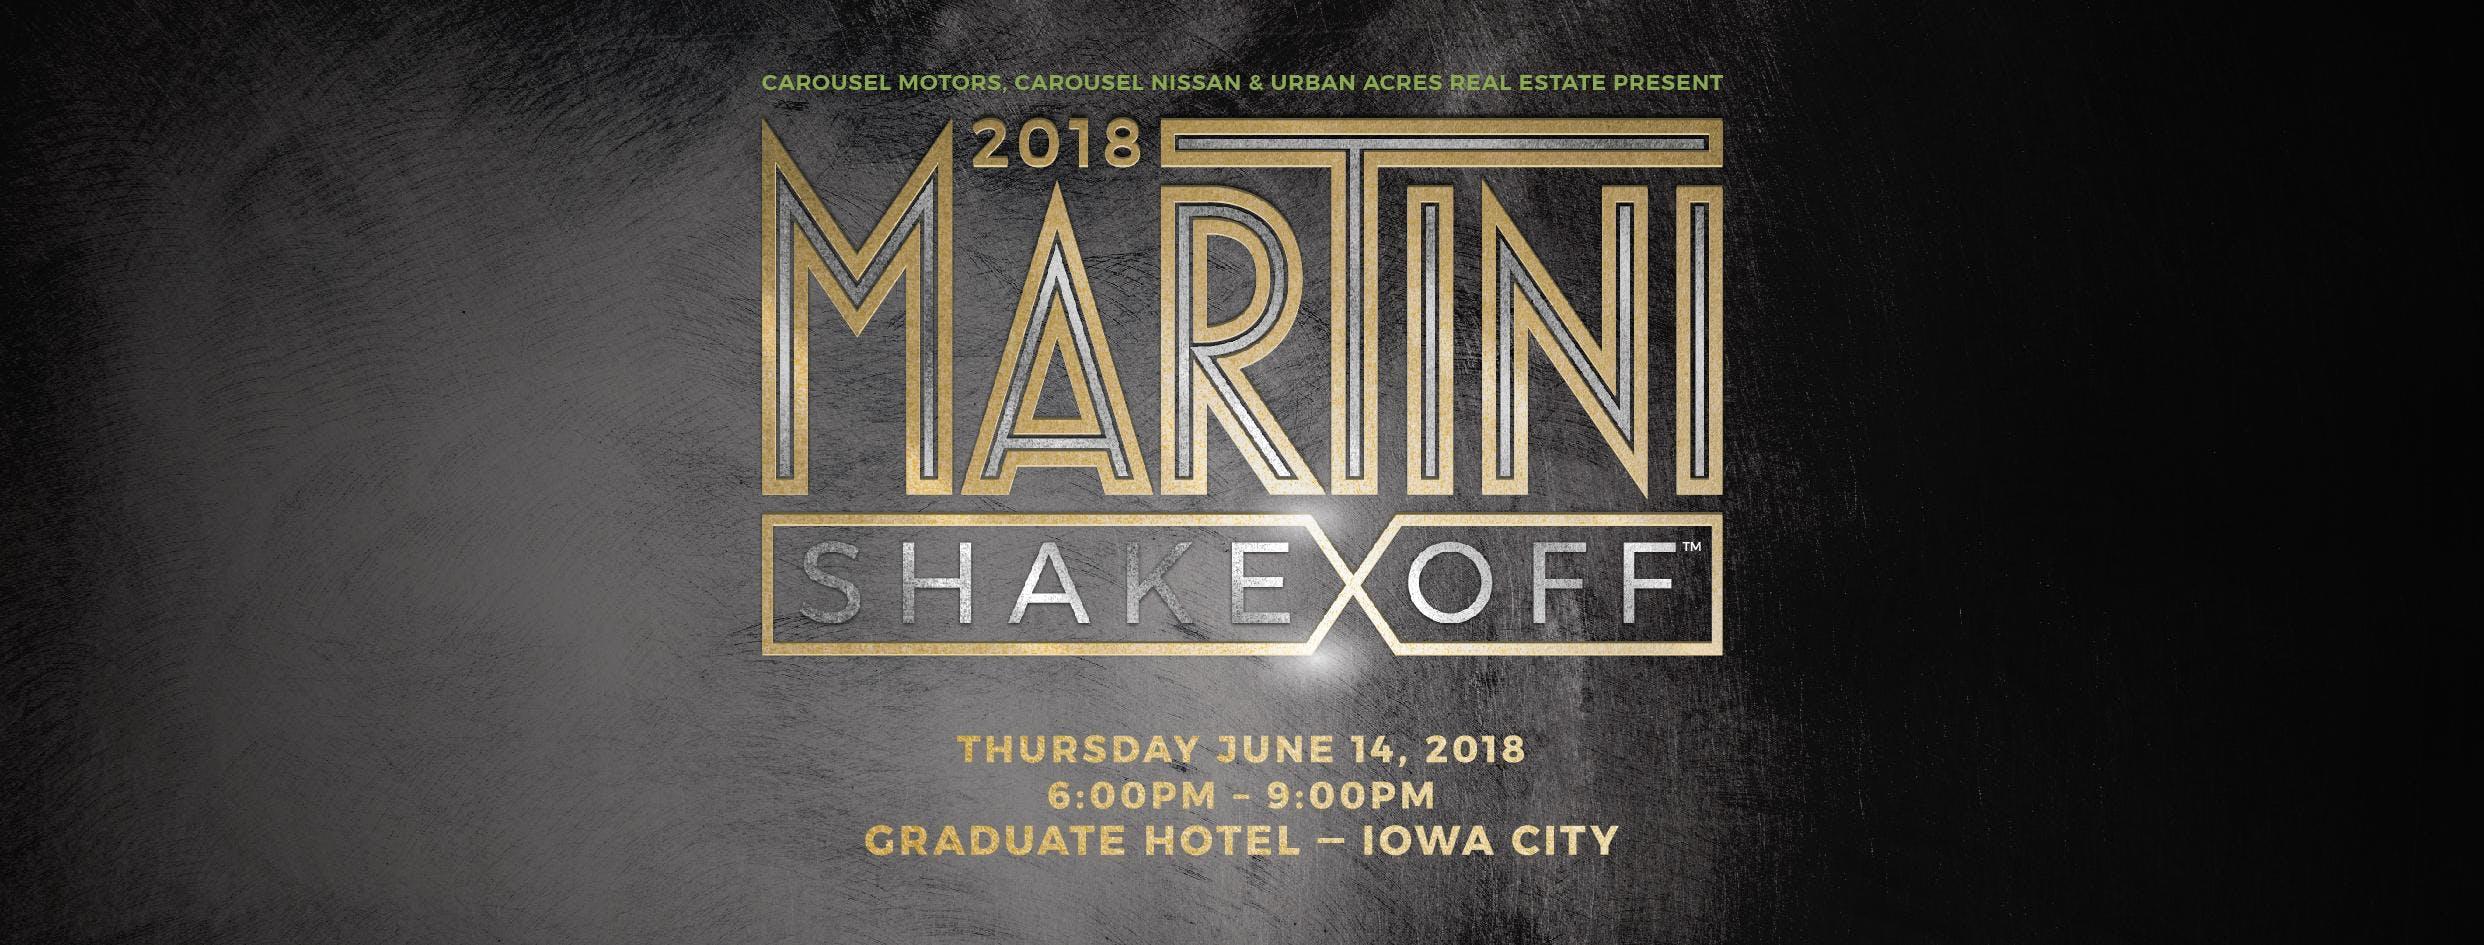 2018 Martini Shake Off™ Benefiting The HAVlife™ Foundation